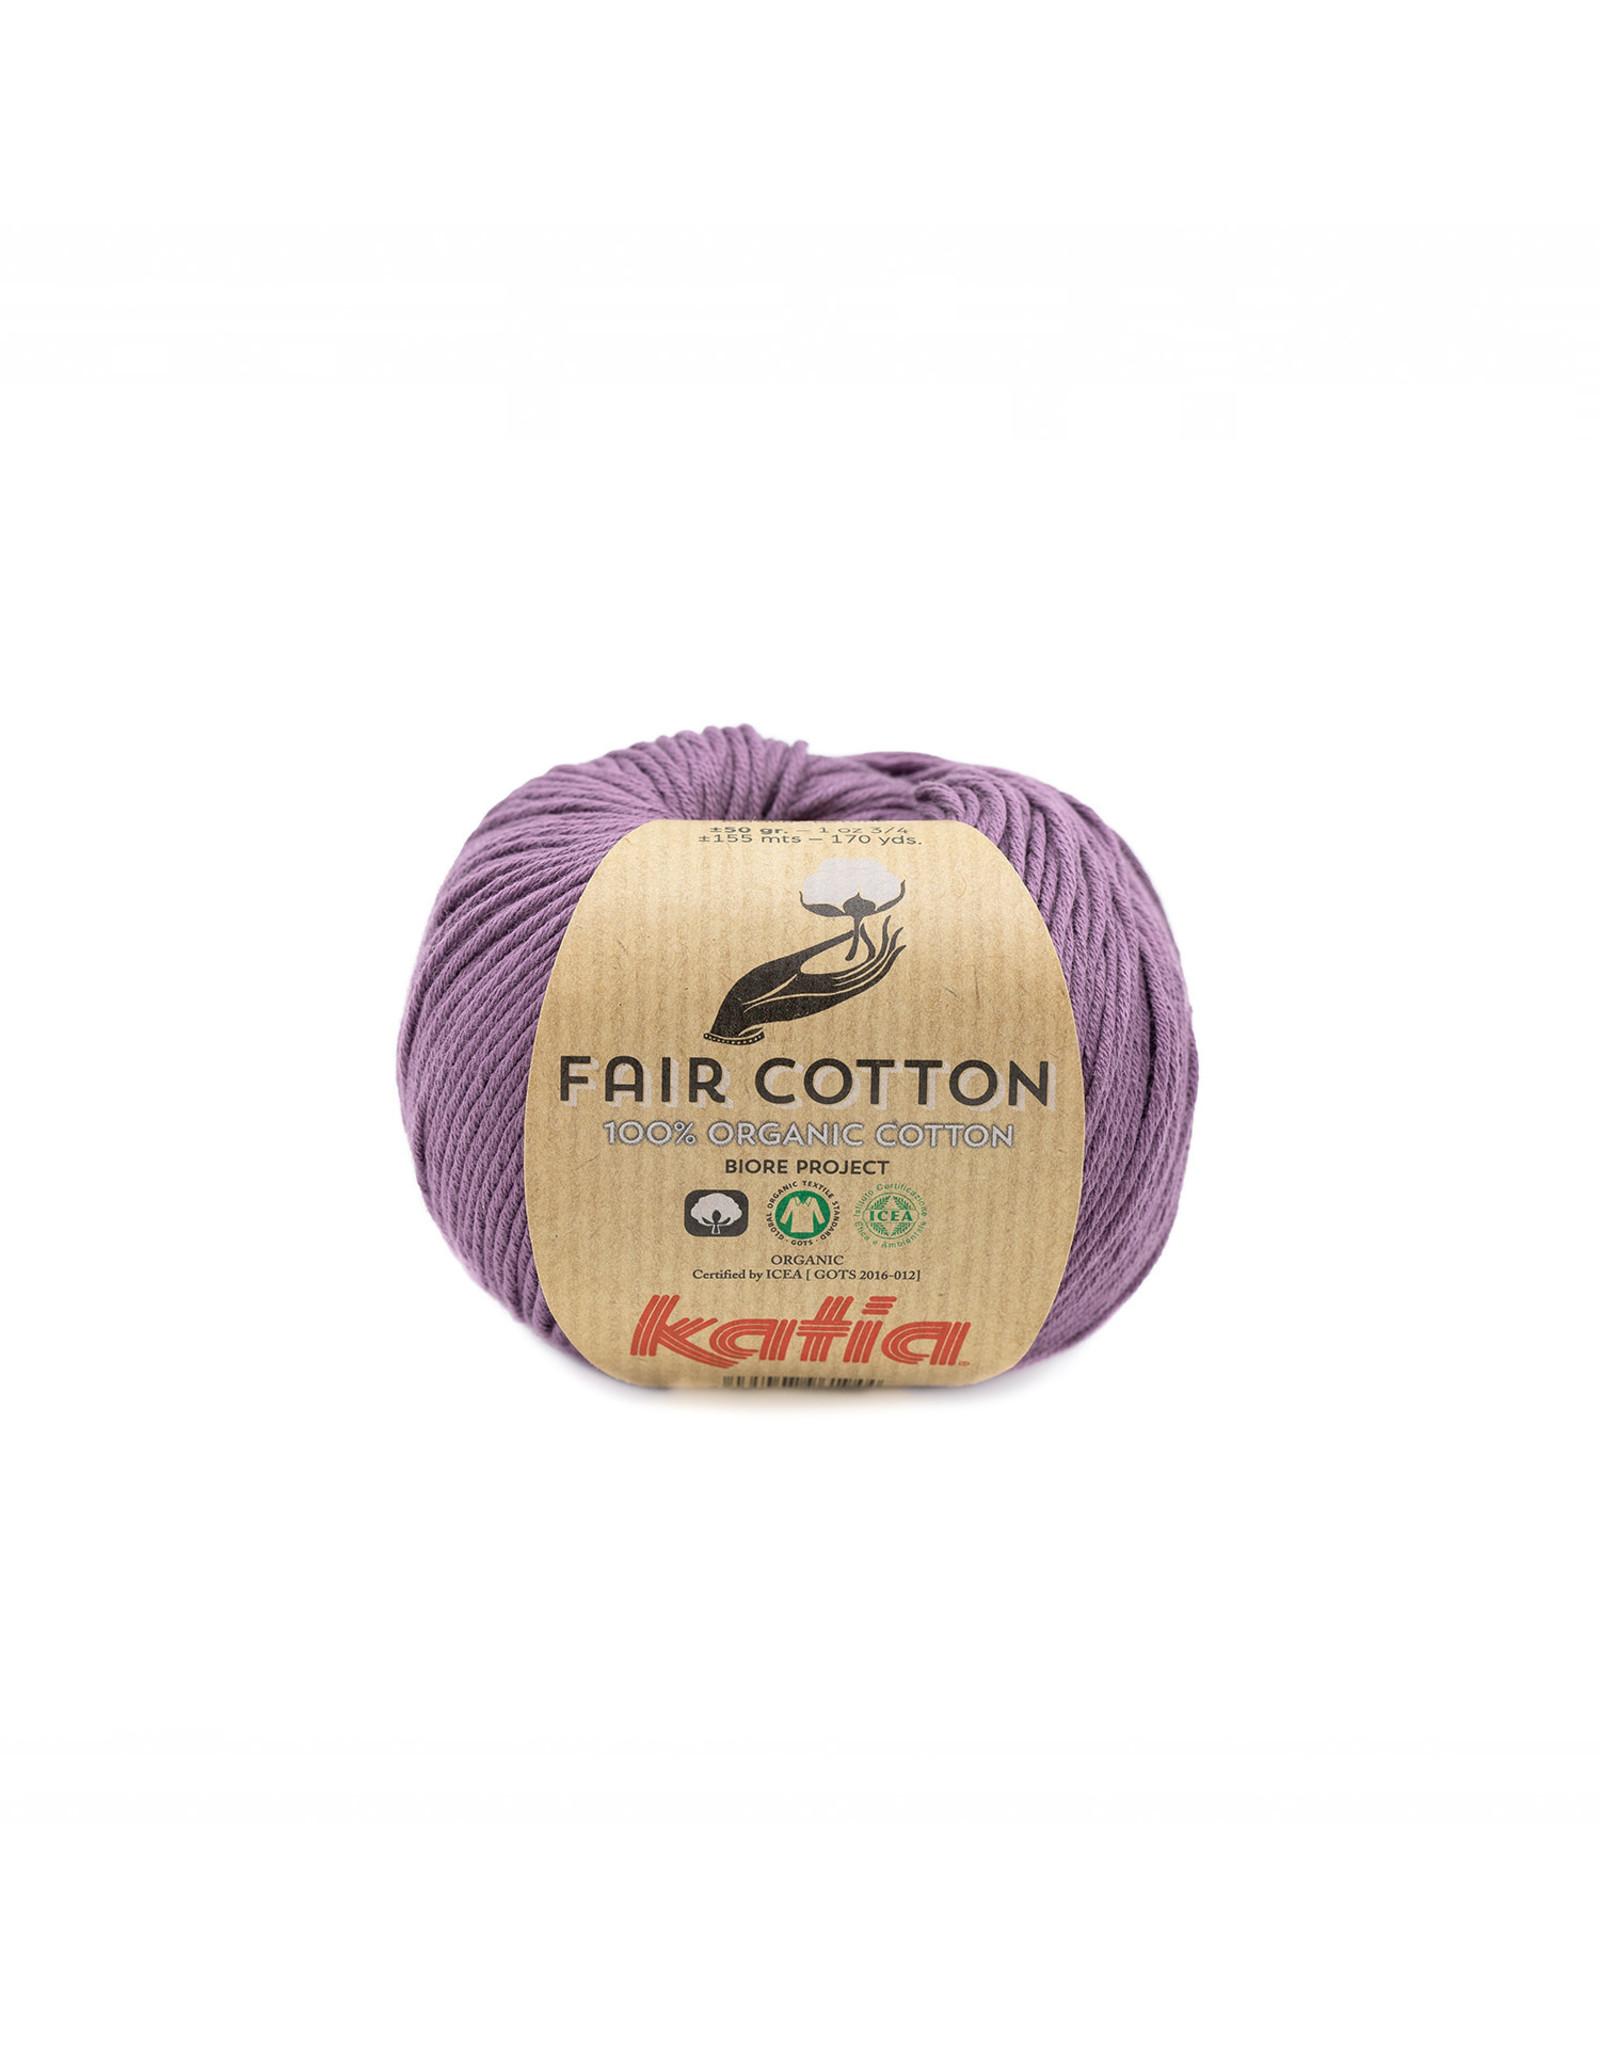 Katia Katia Fair Cotton Kleur 39 - donkerpaars - 100% biol. GOTS katoengaren - bundel 5 x 50 gr./155 m.